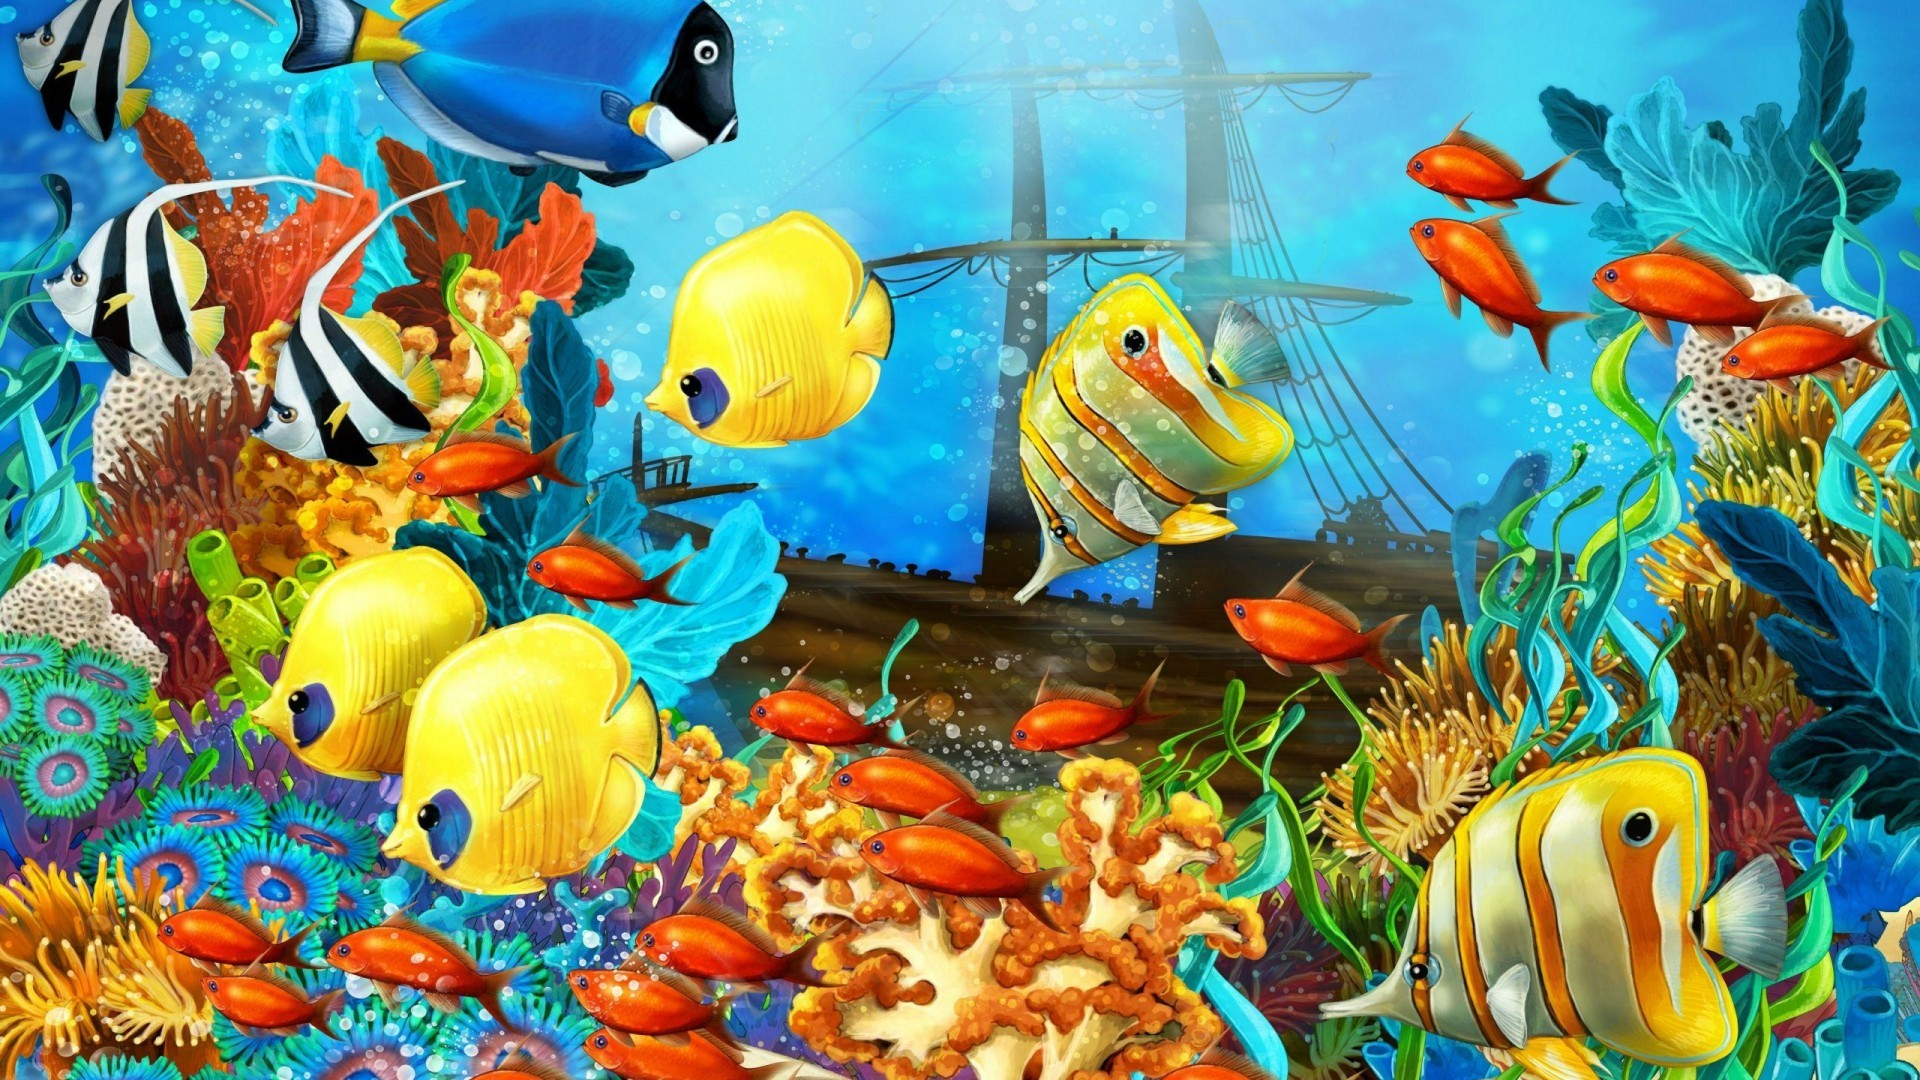 Coral Reef Marine Life HD Wallpaper